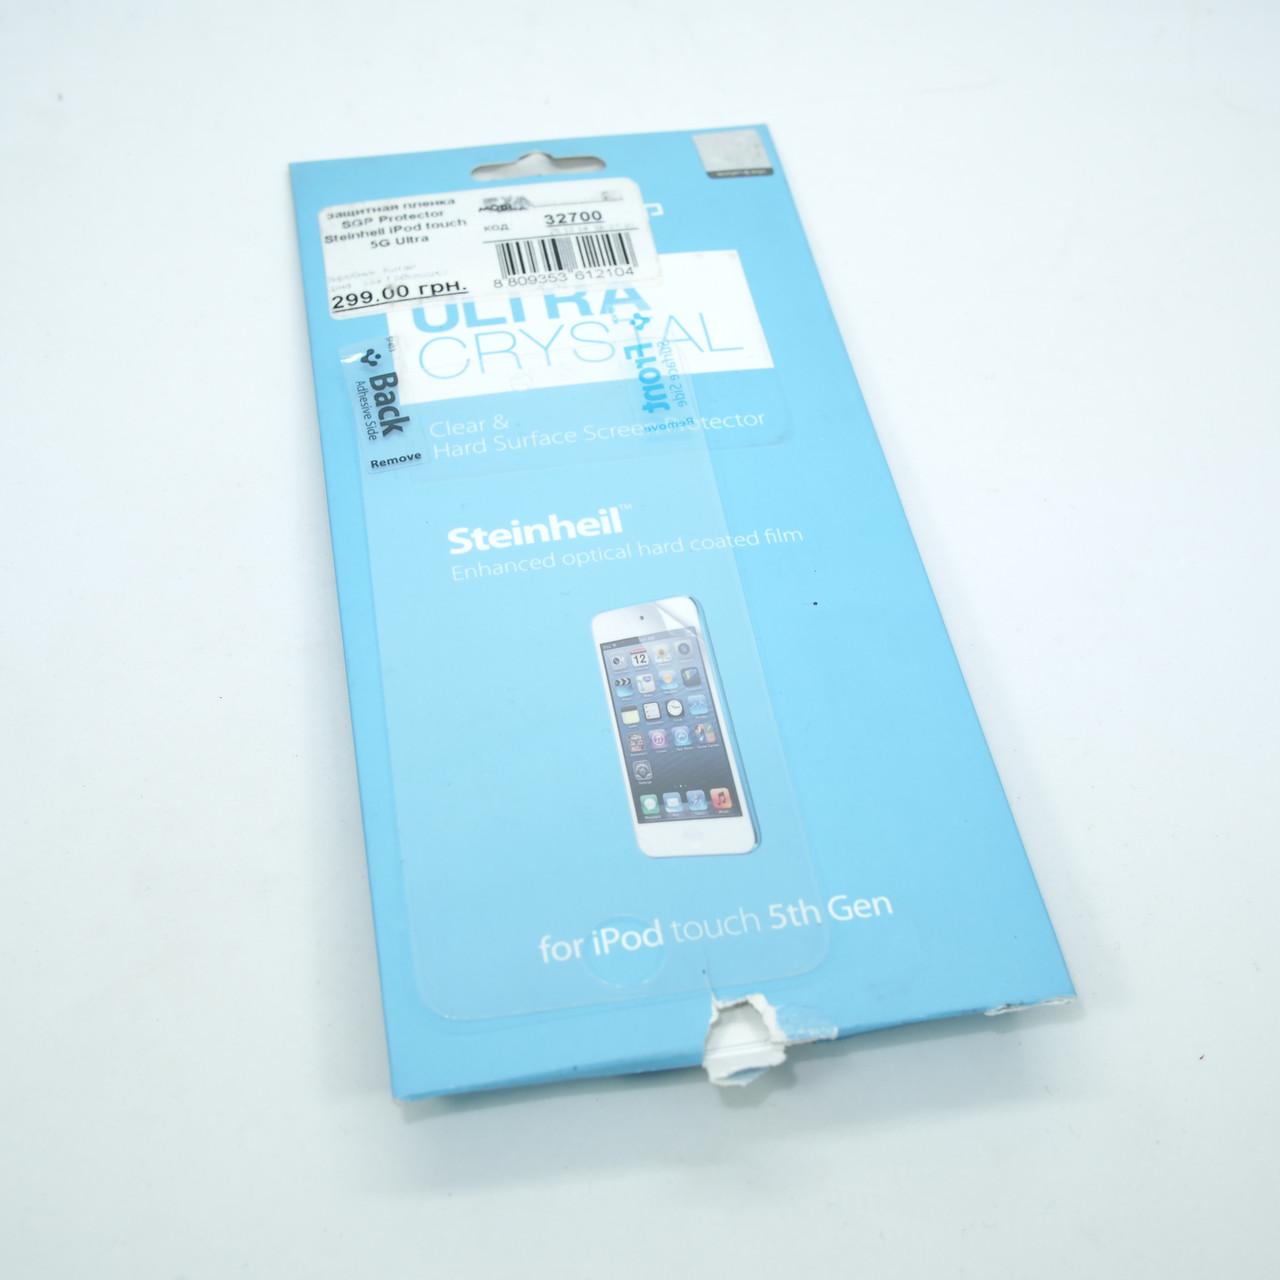 Защитная пленка Spigen Protector Steinheil iPod touch 5G Ultra Crystal Для телефона Ult